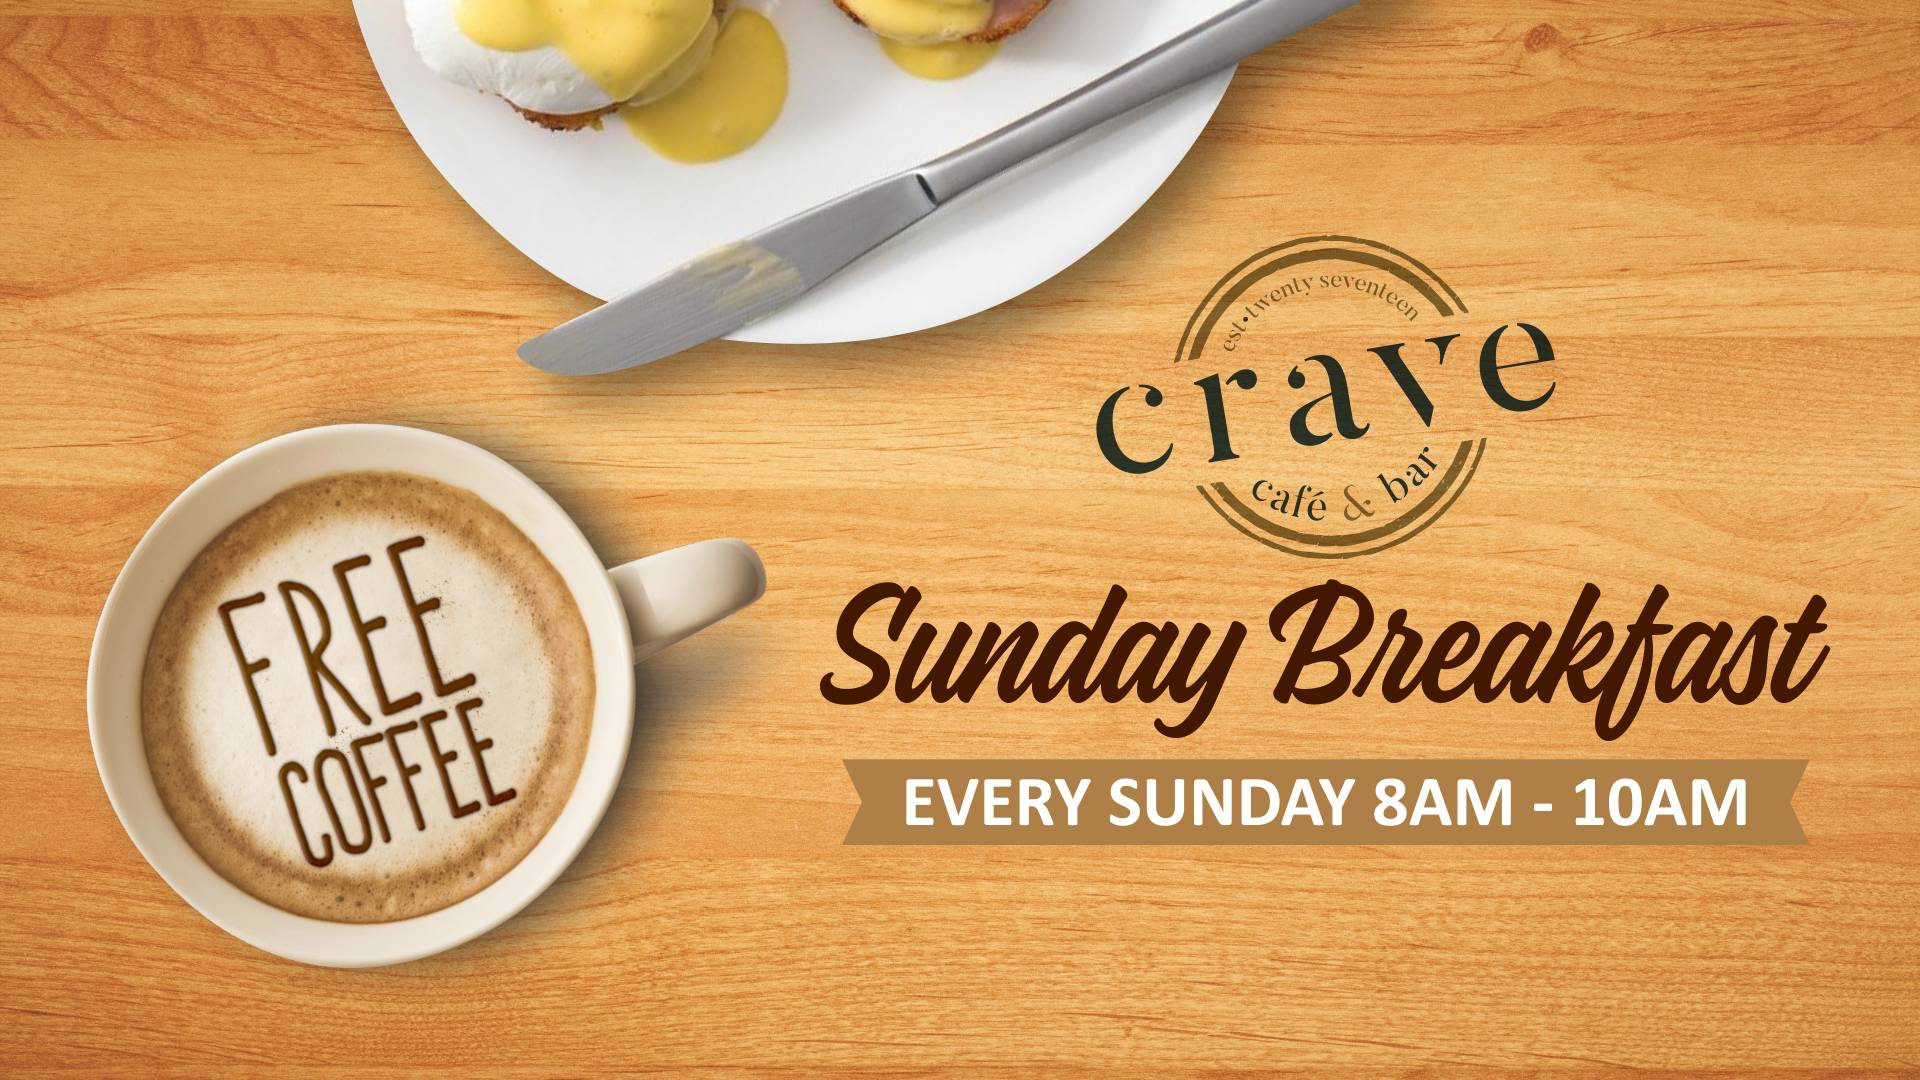 CRAVE-SUNDAY BREAKFAST